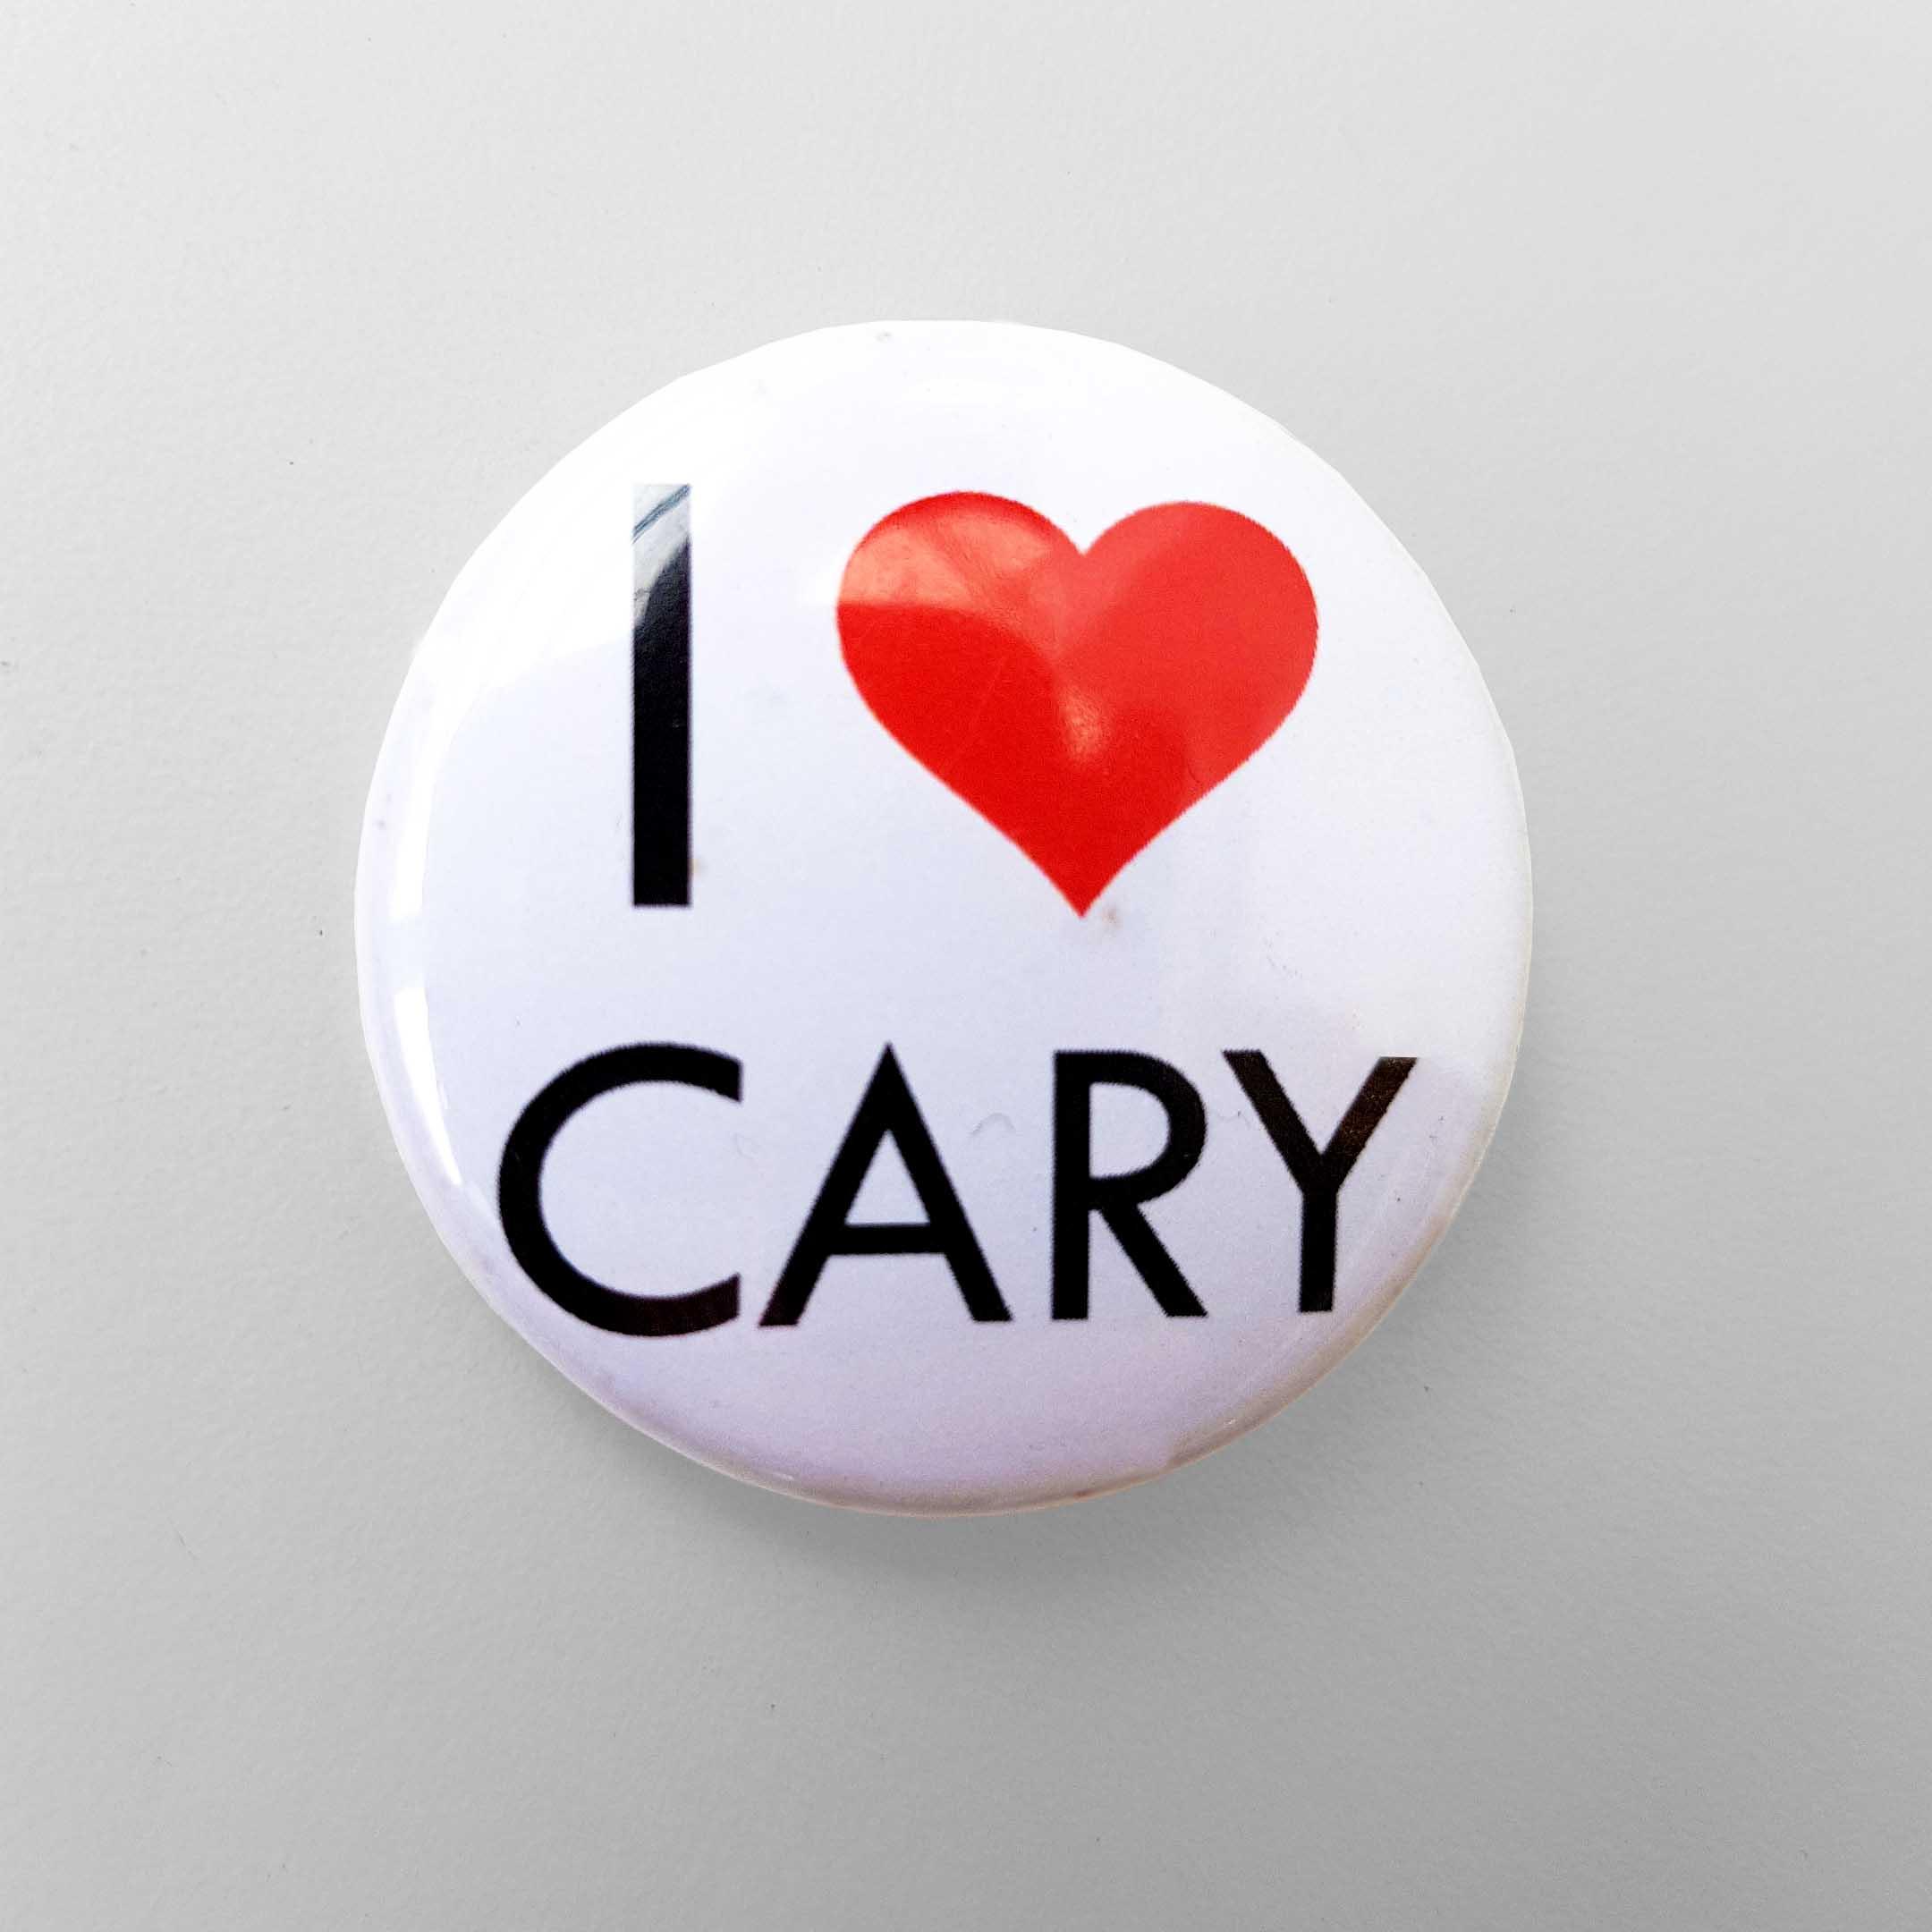 Buy Cary Grant Pin Badge (I Love Cary)